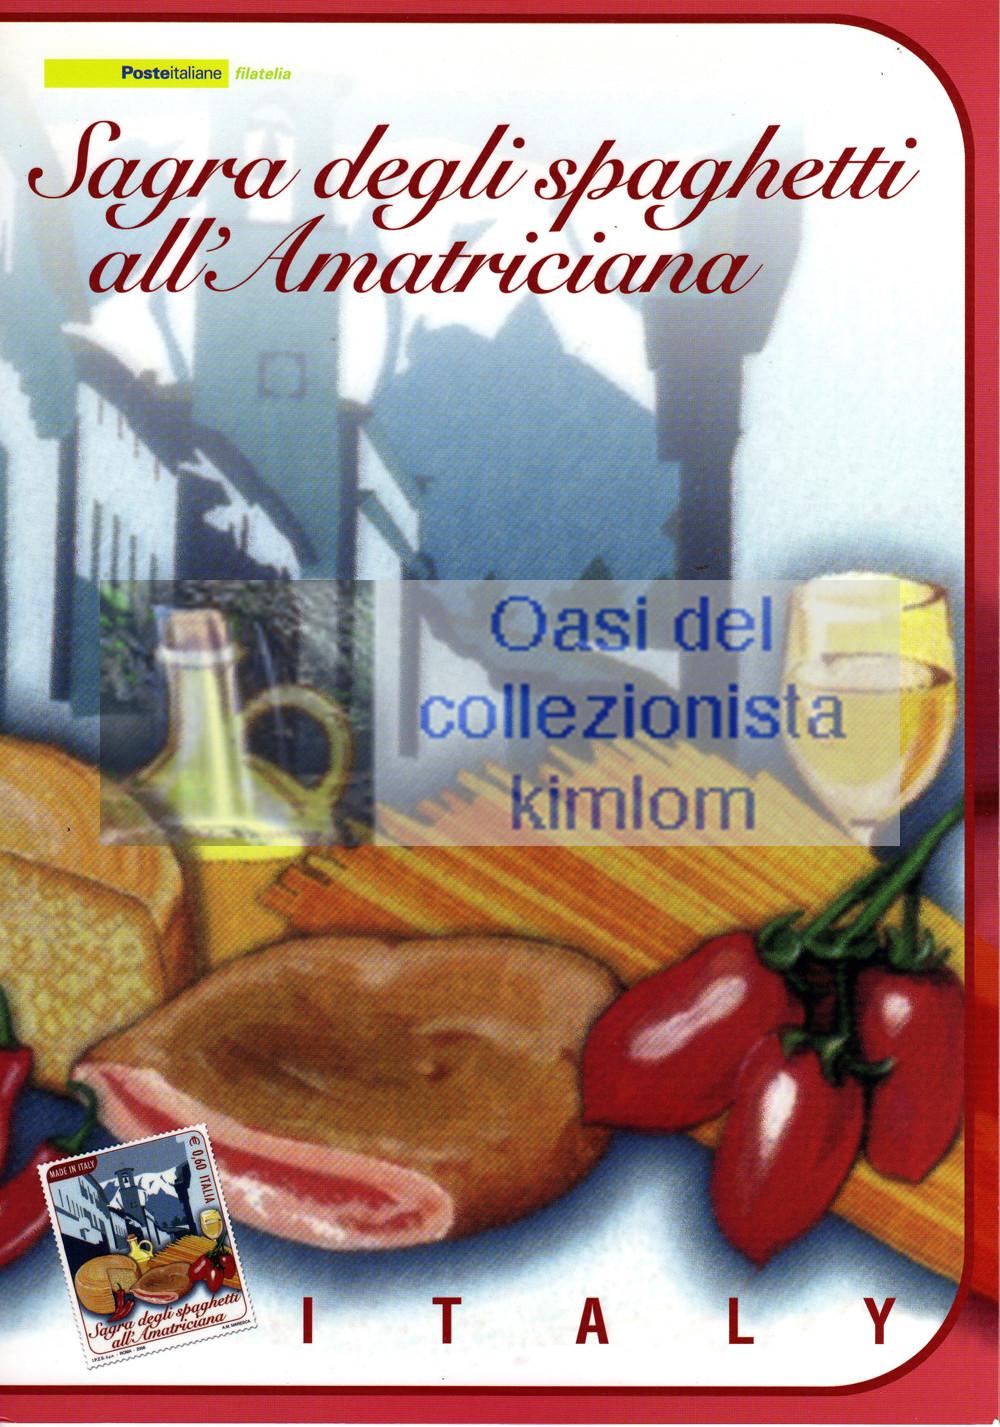 folder - Sagra degli spaghetti all'Amatriciana